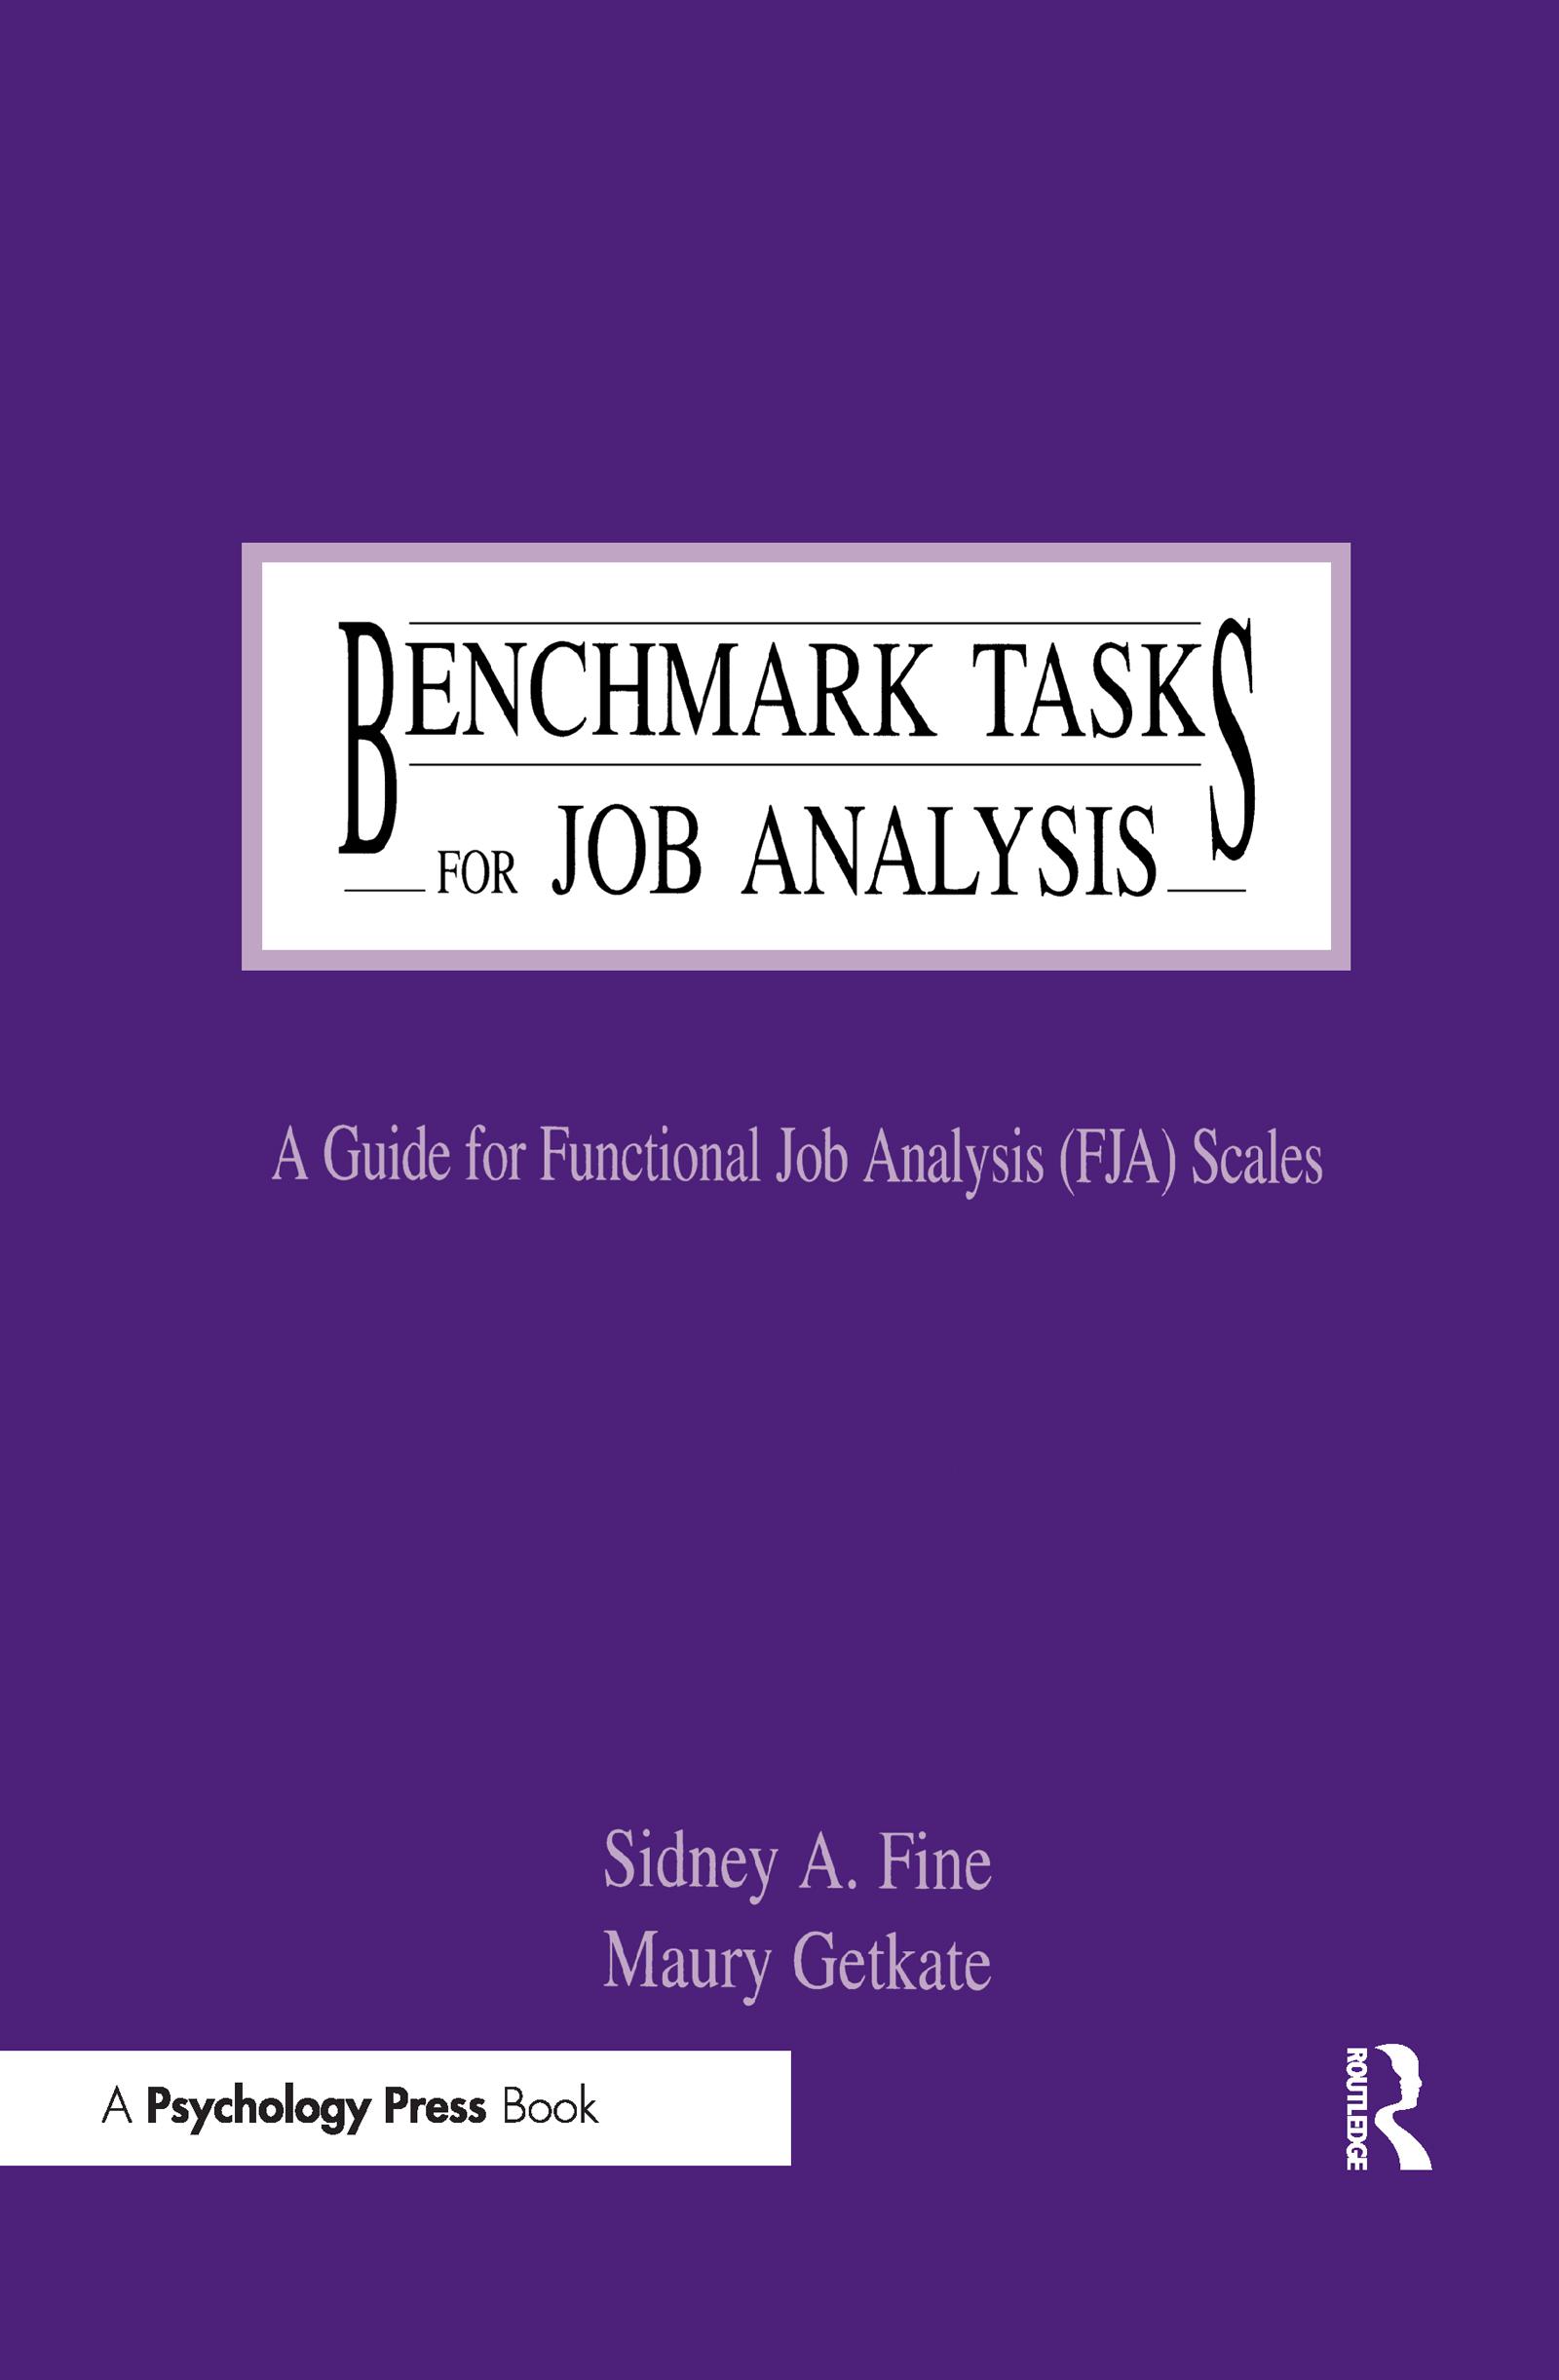 Benchmark Tasks for Job Analysis